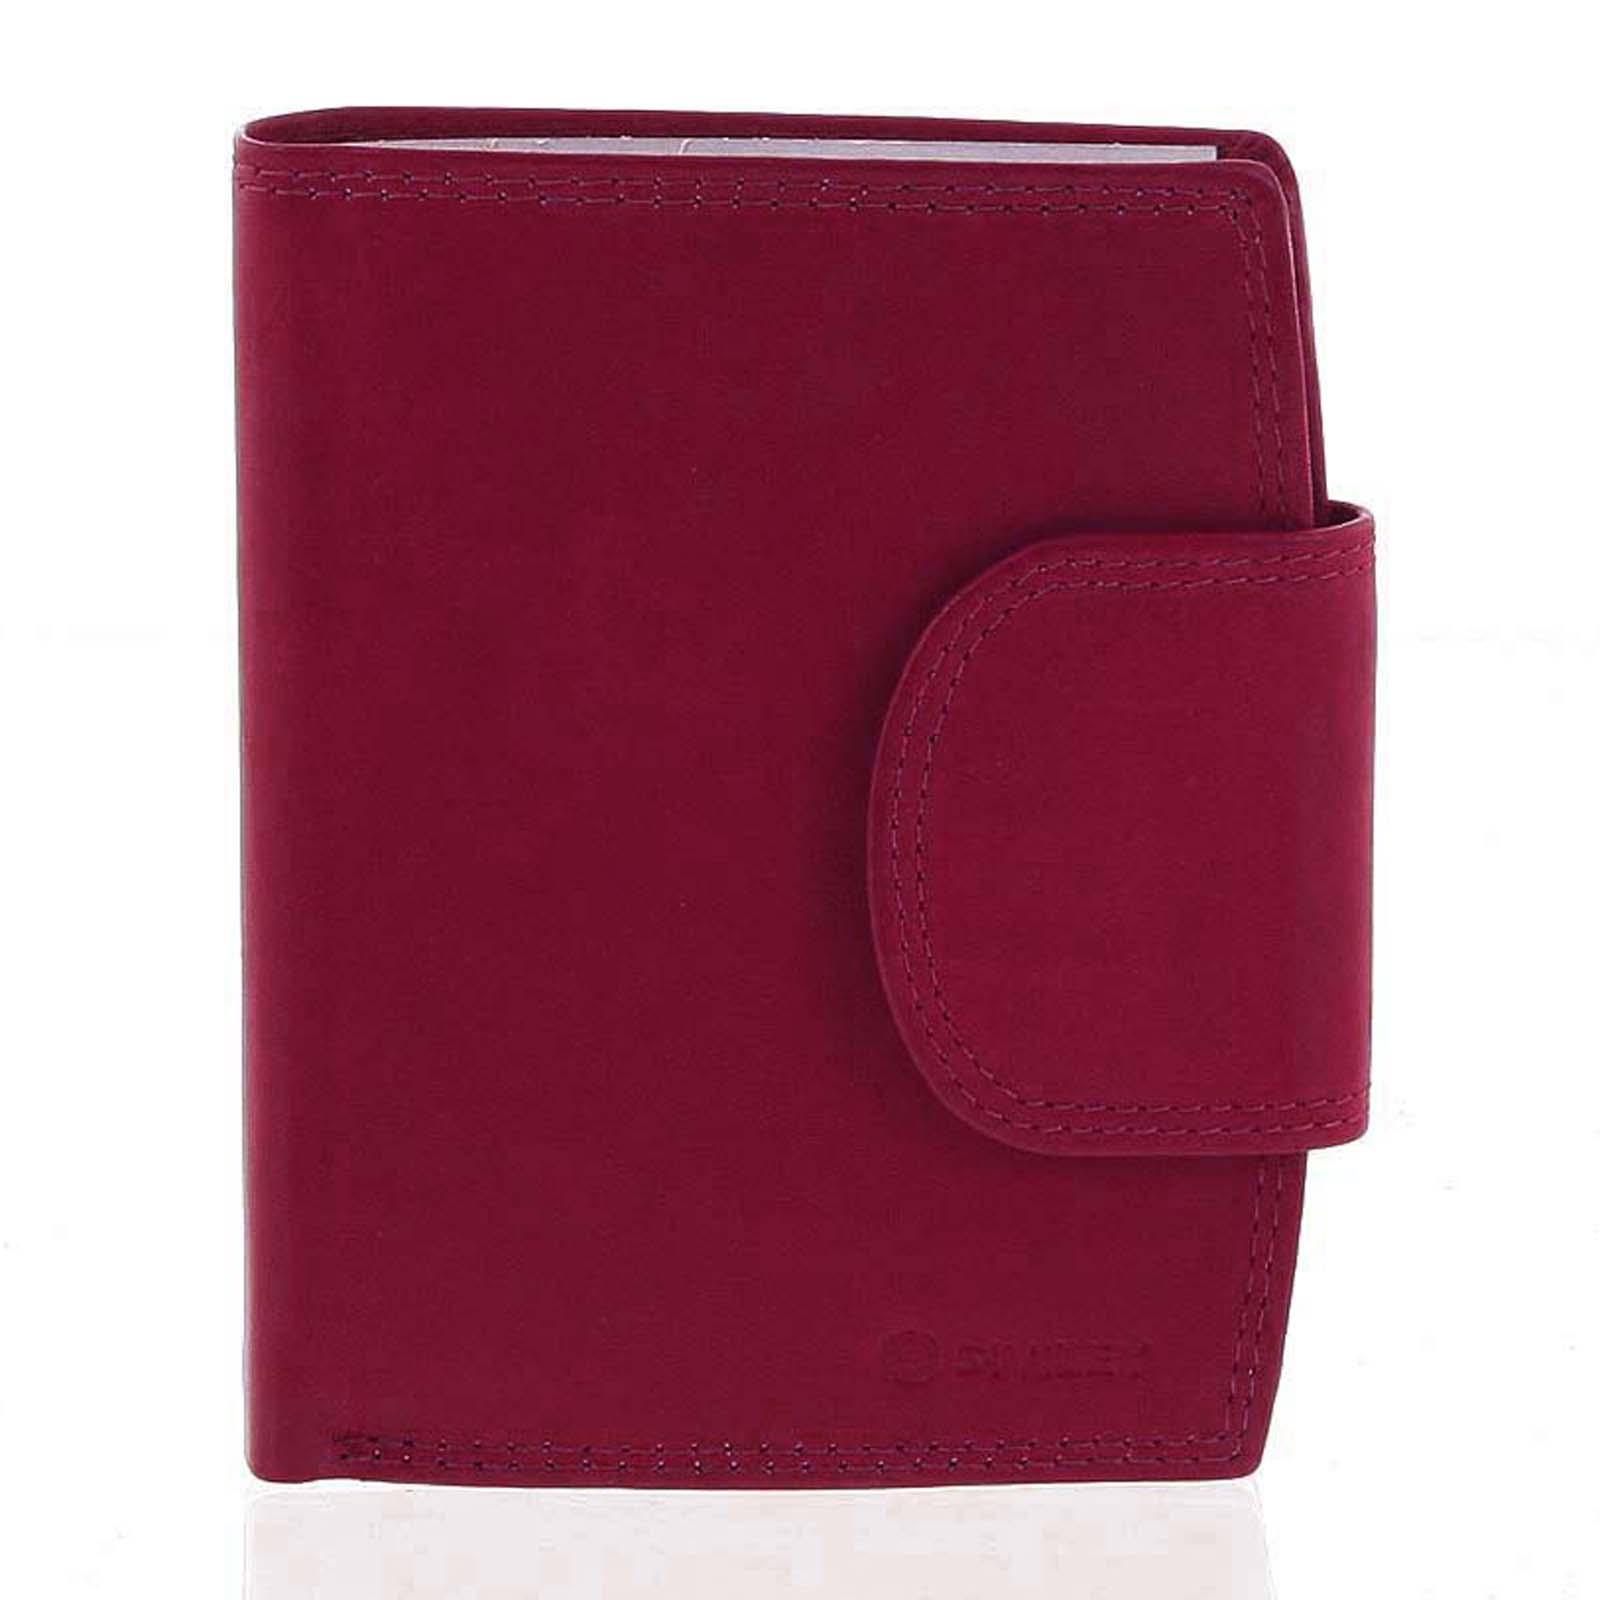 Elegantná červená kožená peňaženka so zápinkou - Diviley Universit